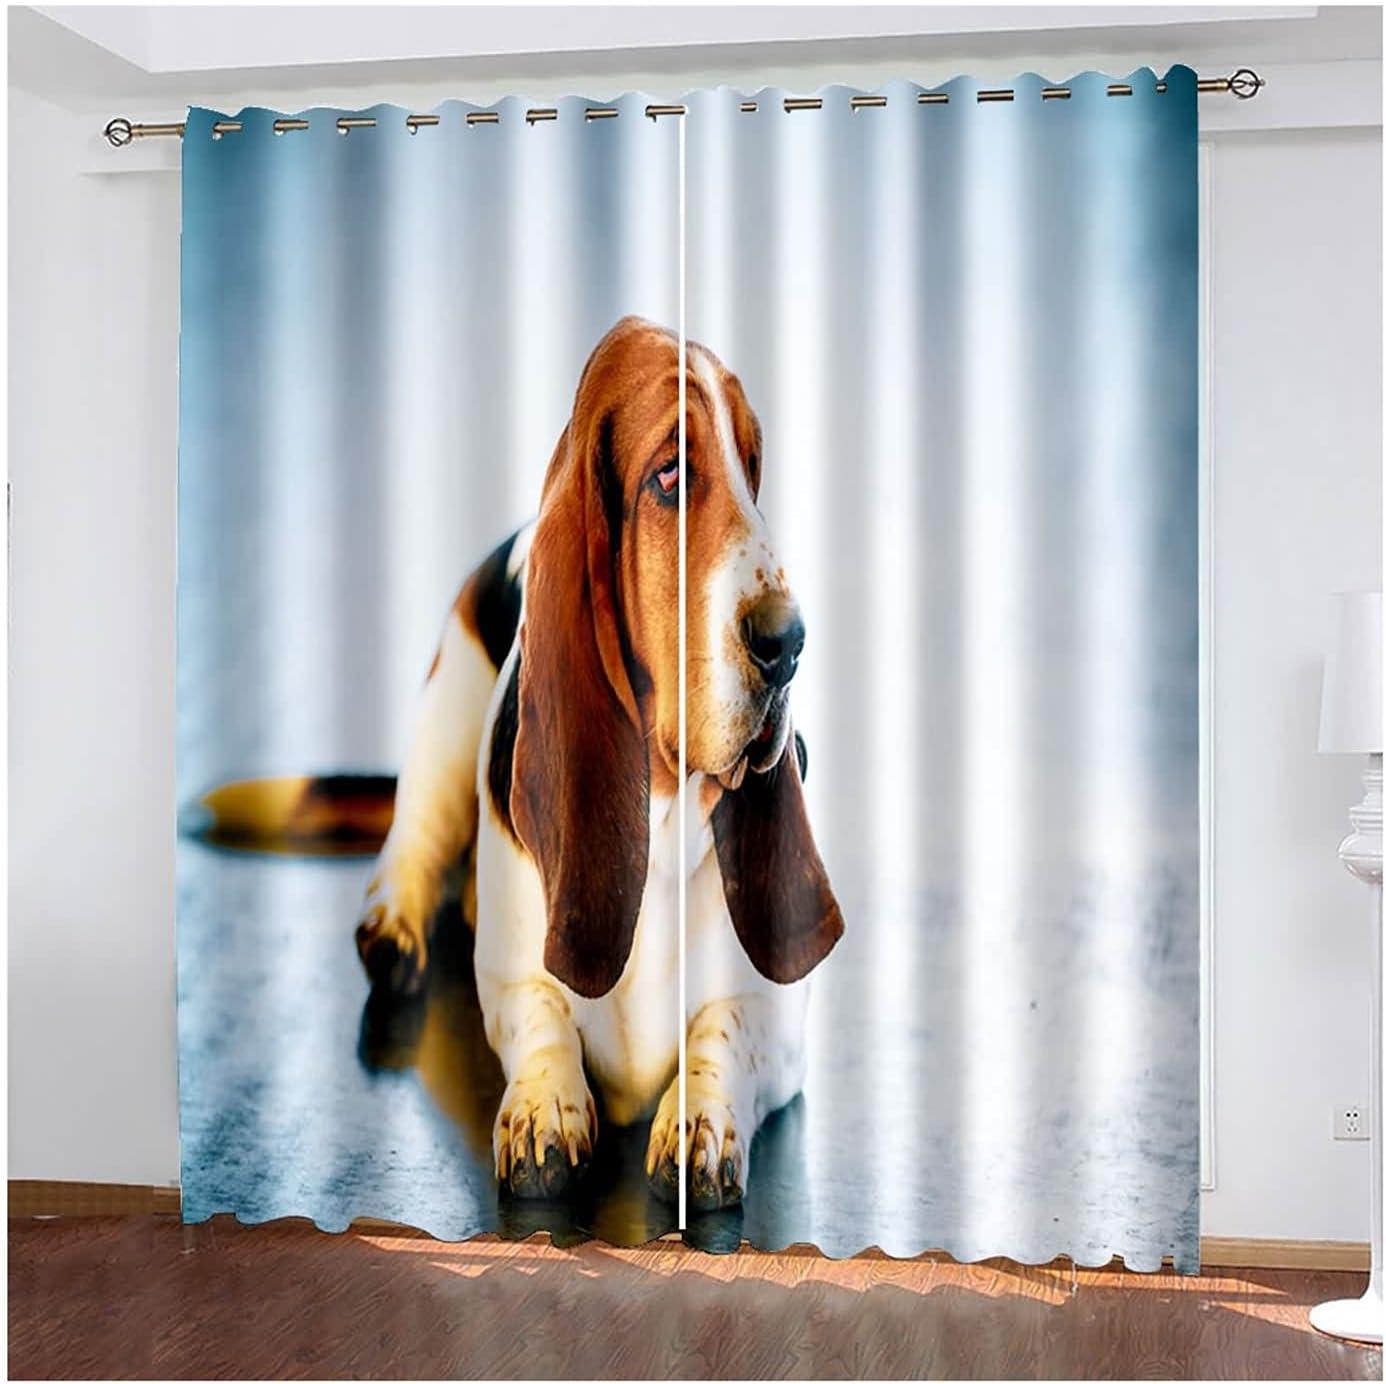 Daesar Curtains for Livingroom mart Blackout Max 63% OFF Panel 2 Bedroo